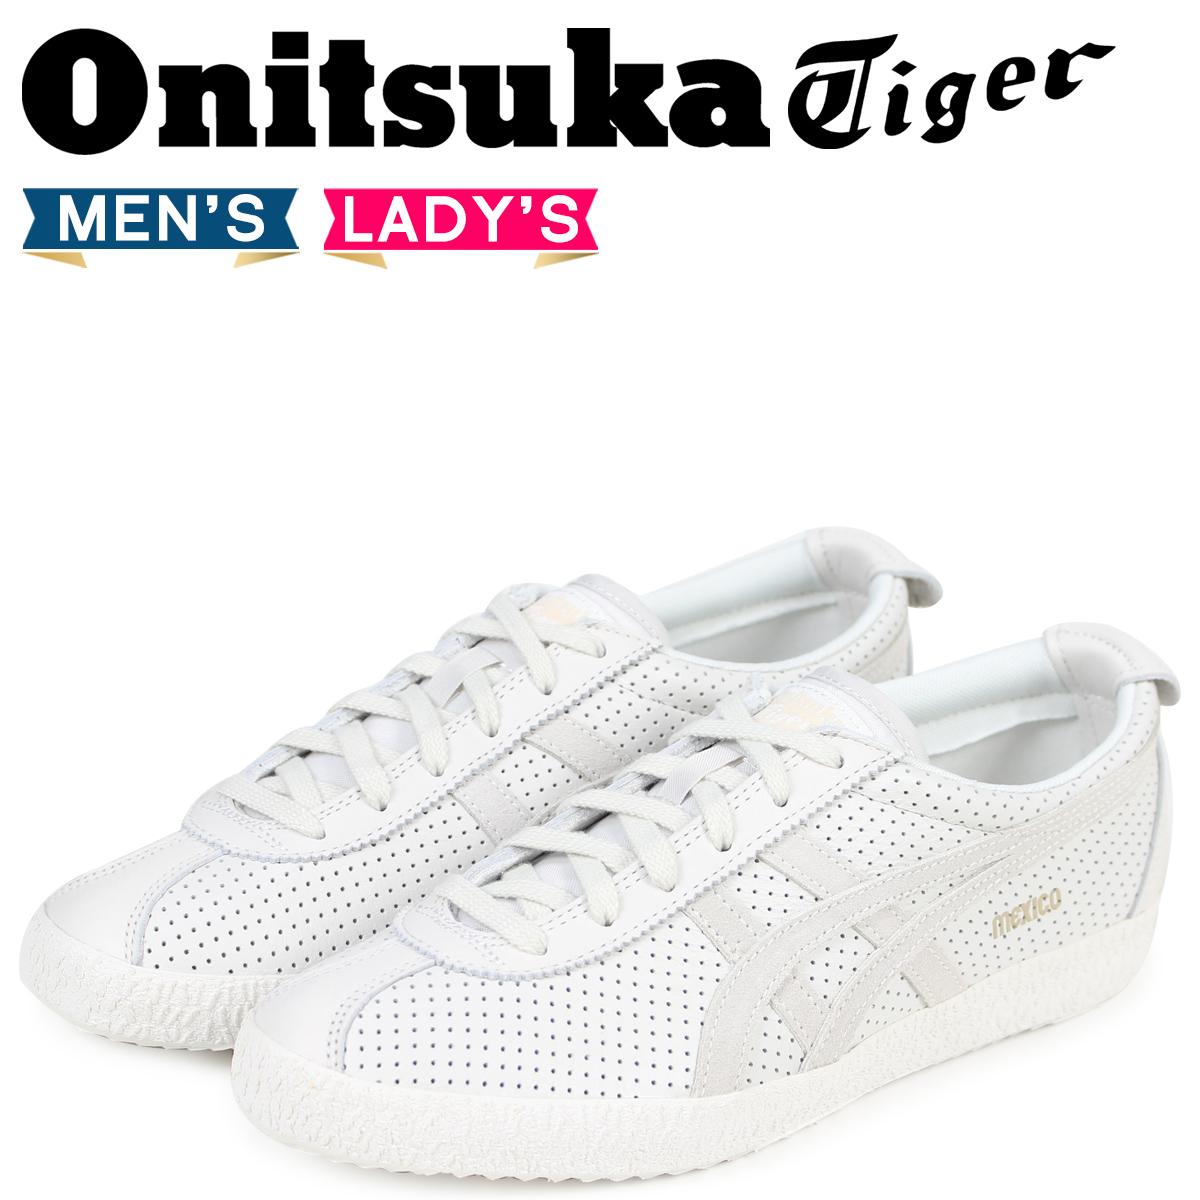 Onitsuka Tiger セラーノ オニツカタイガー SERRANO メンズ レディース スニーカー D109L-9601 TH109L-9601 グレー